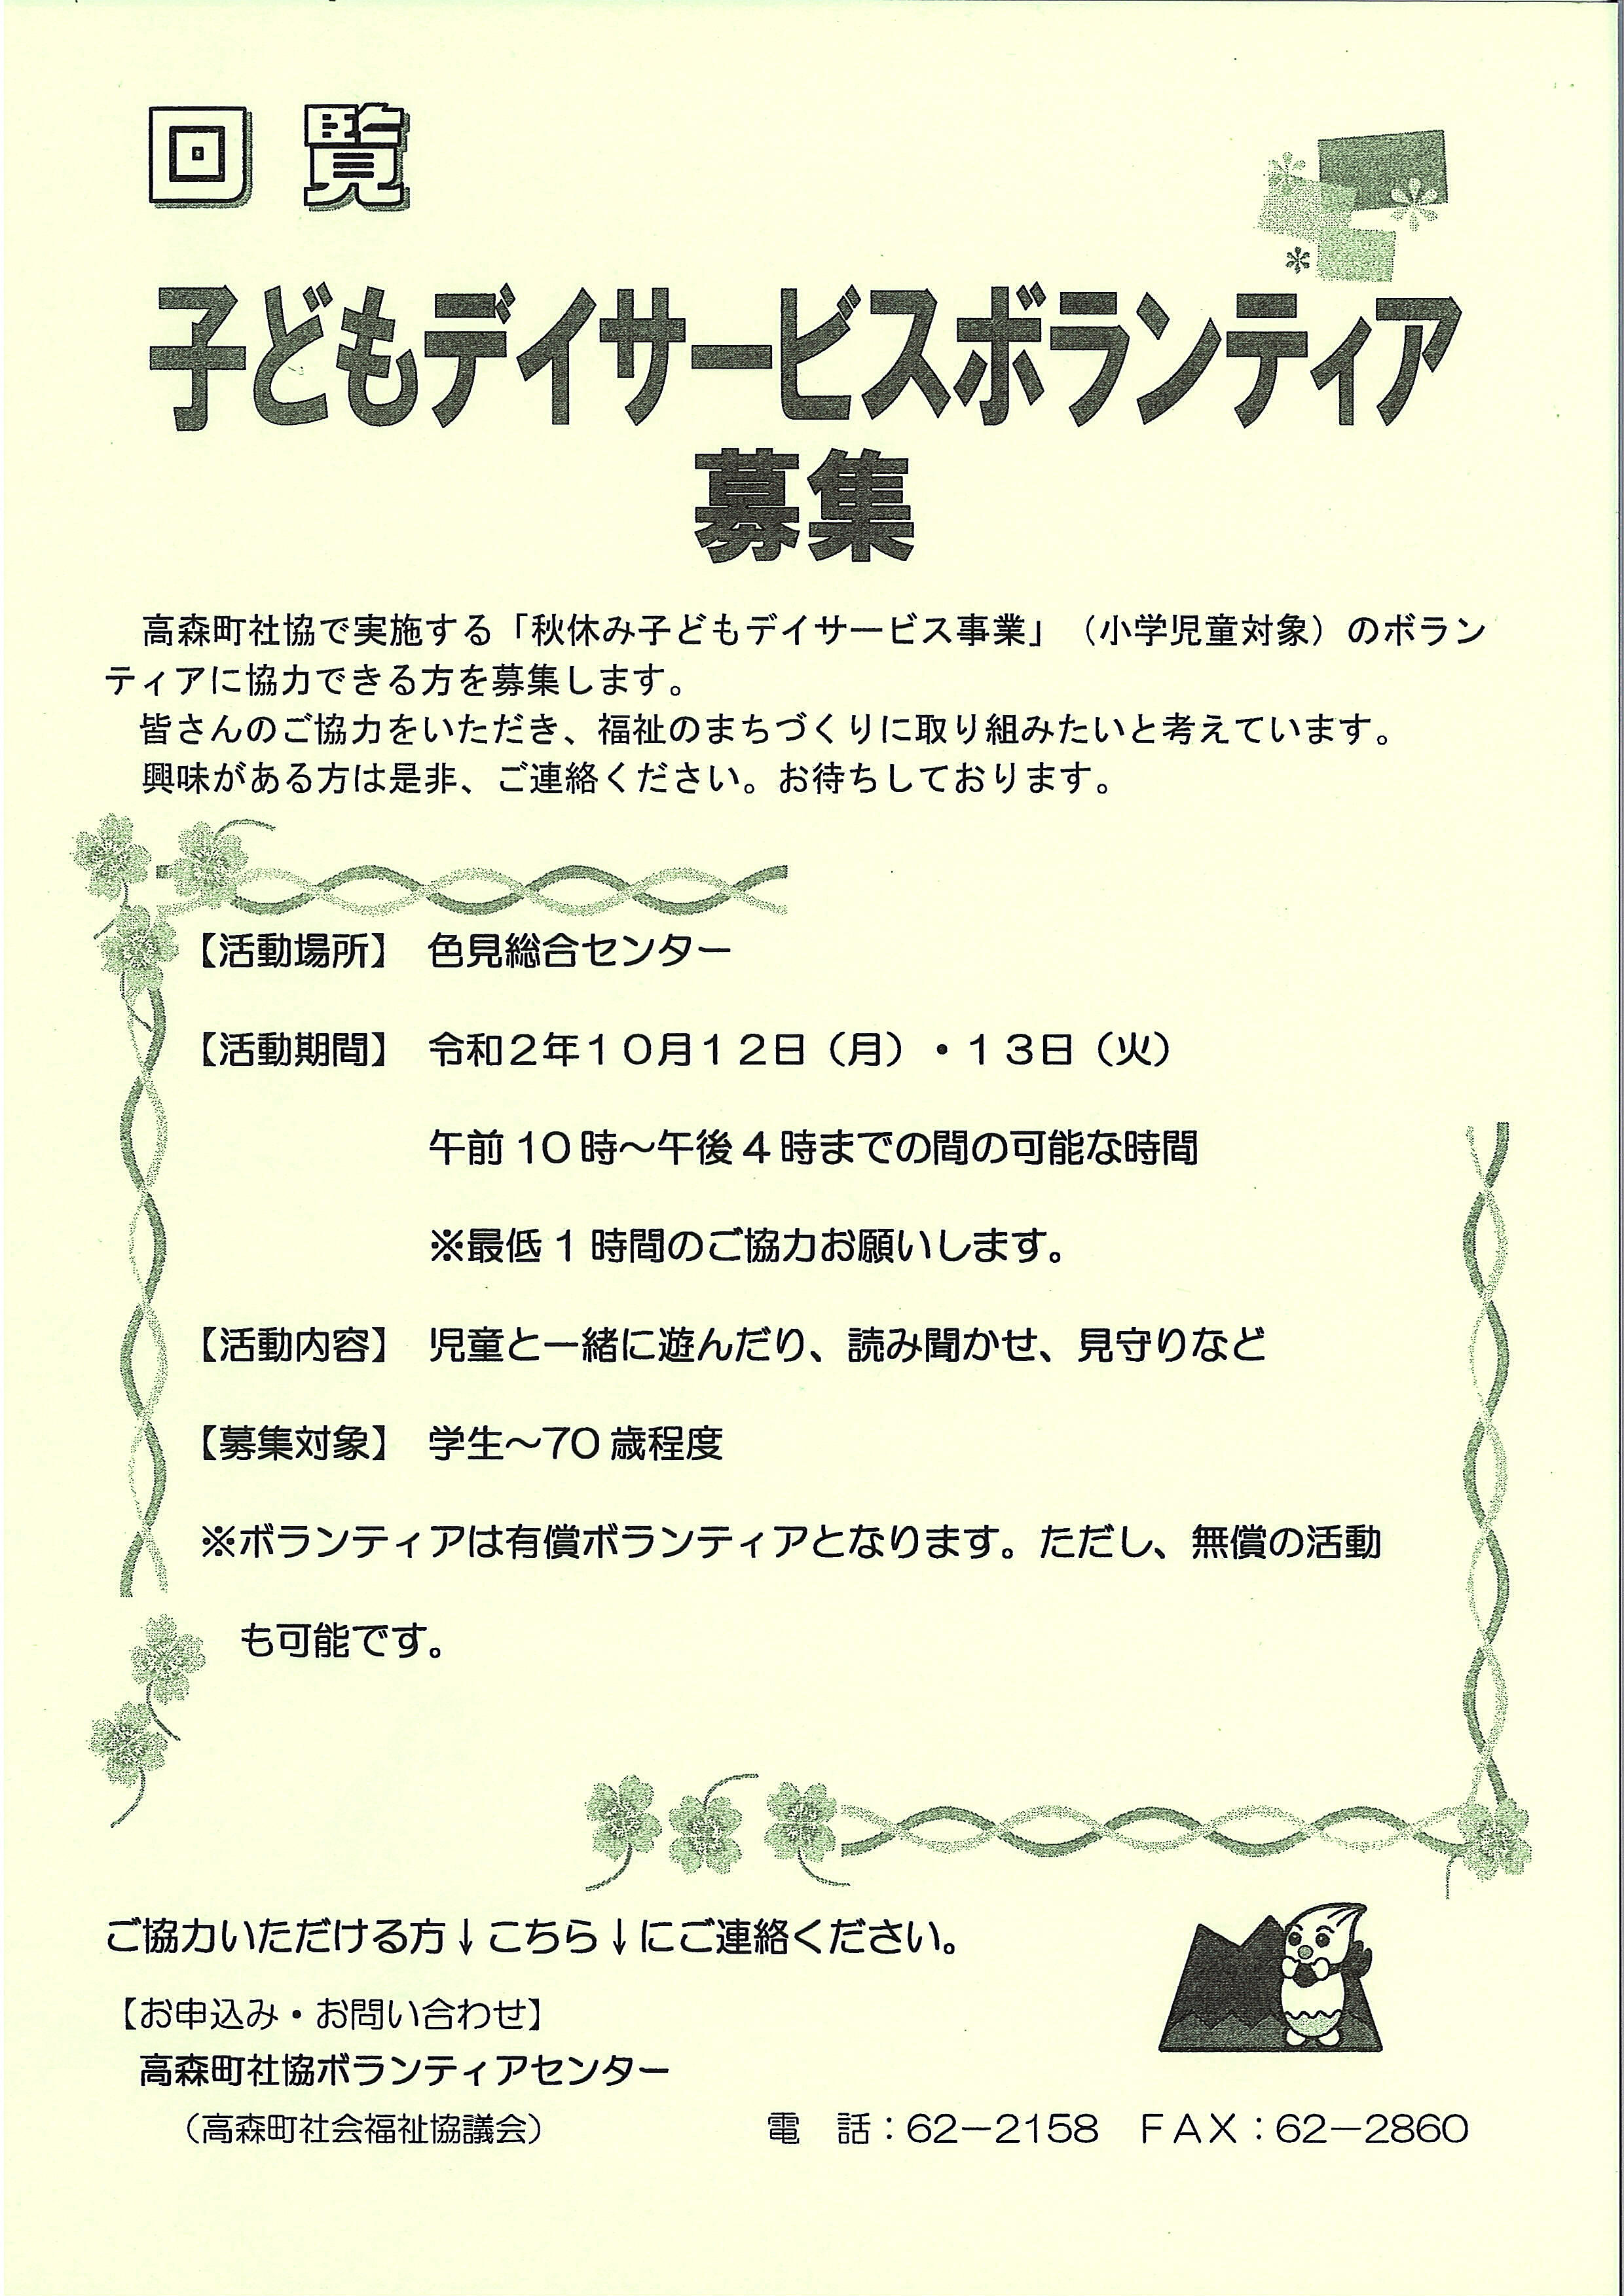 http://www.town.takamori.kumamoto.jp/chosha/somu/upload/4c960f1b5e1f43ee598beffe1b53b93356ca91f6.jpg